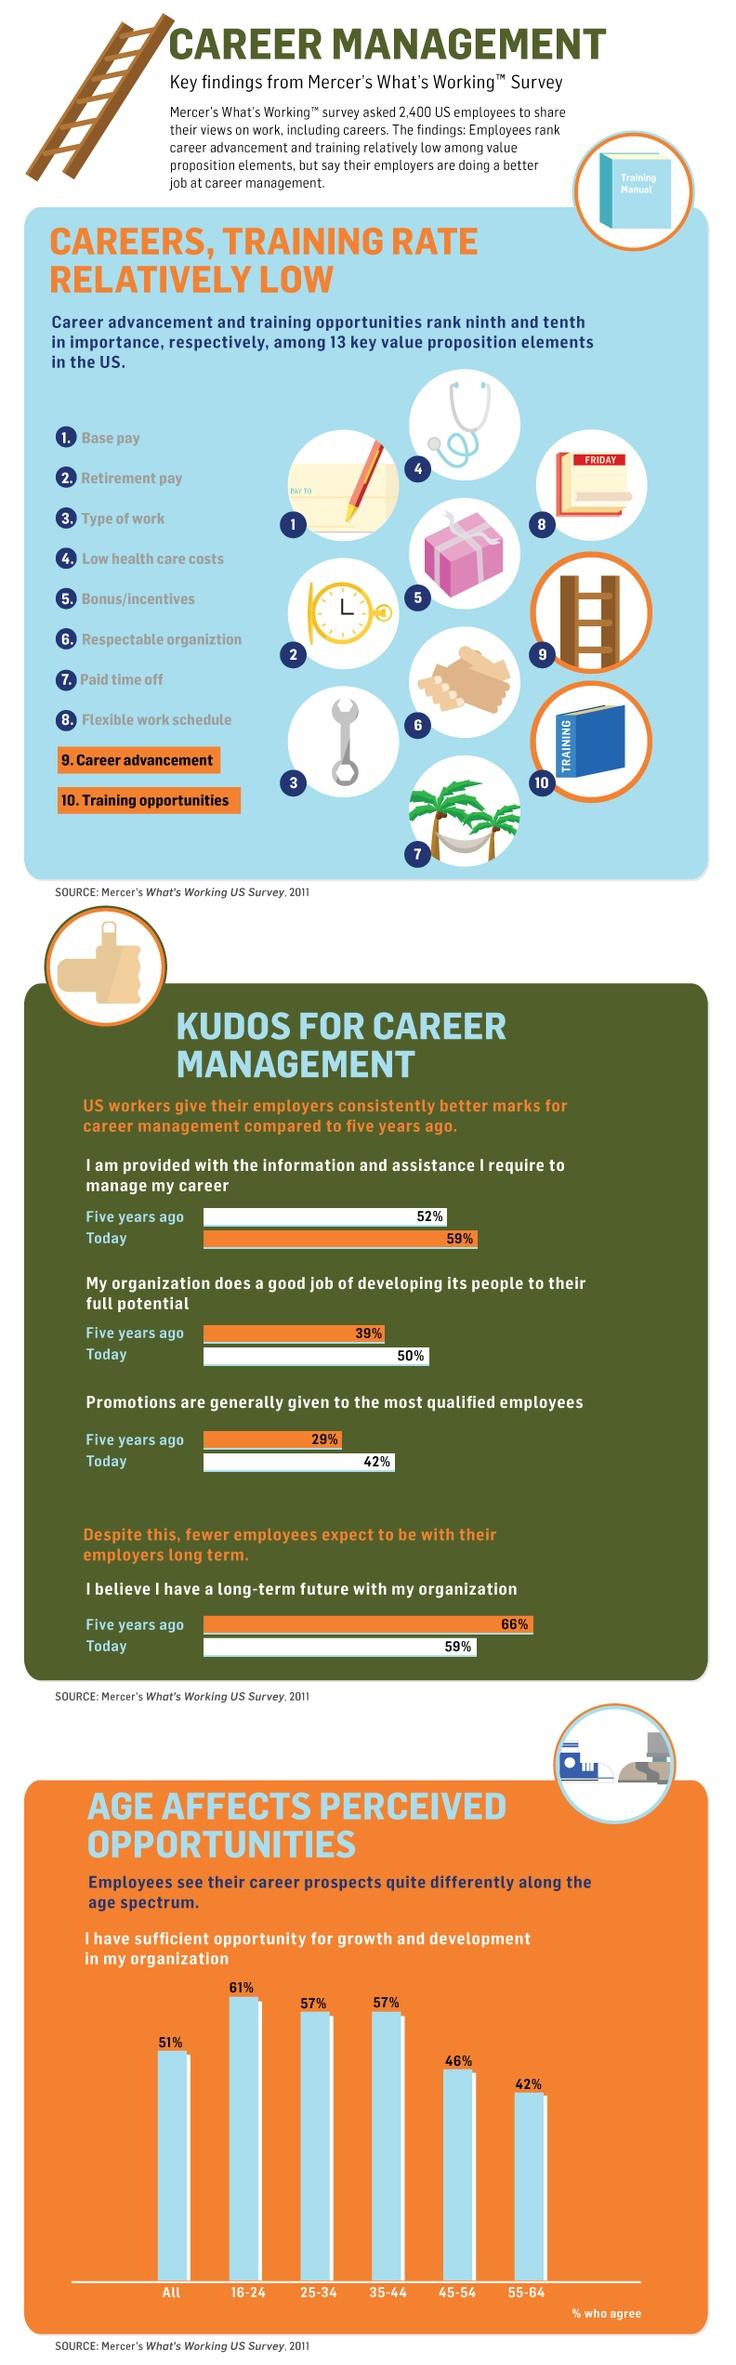 34 best DG Tips images on Pinterest | Job interviews, Social media ...